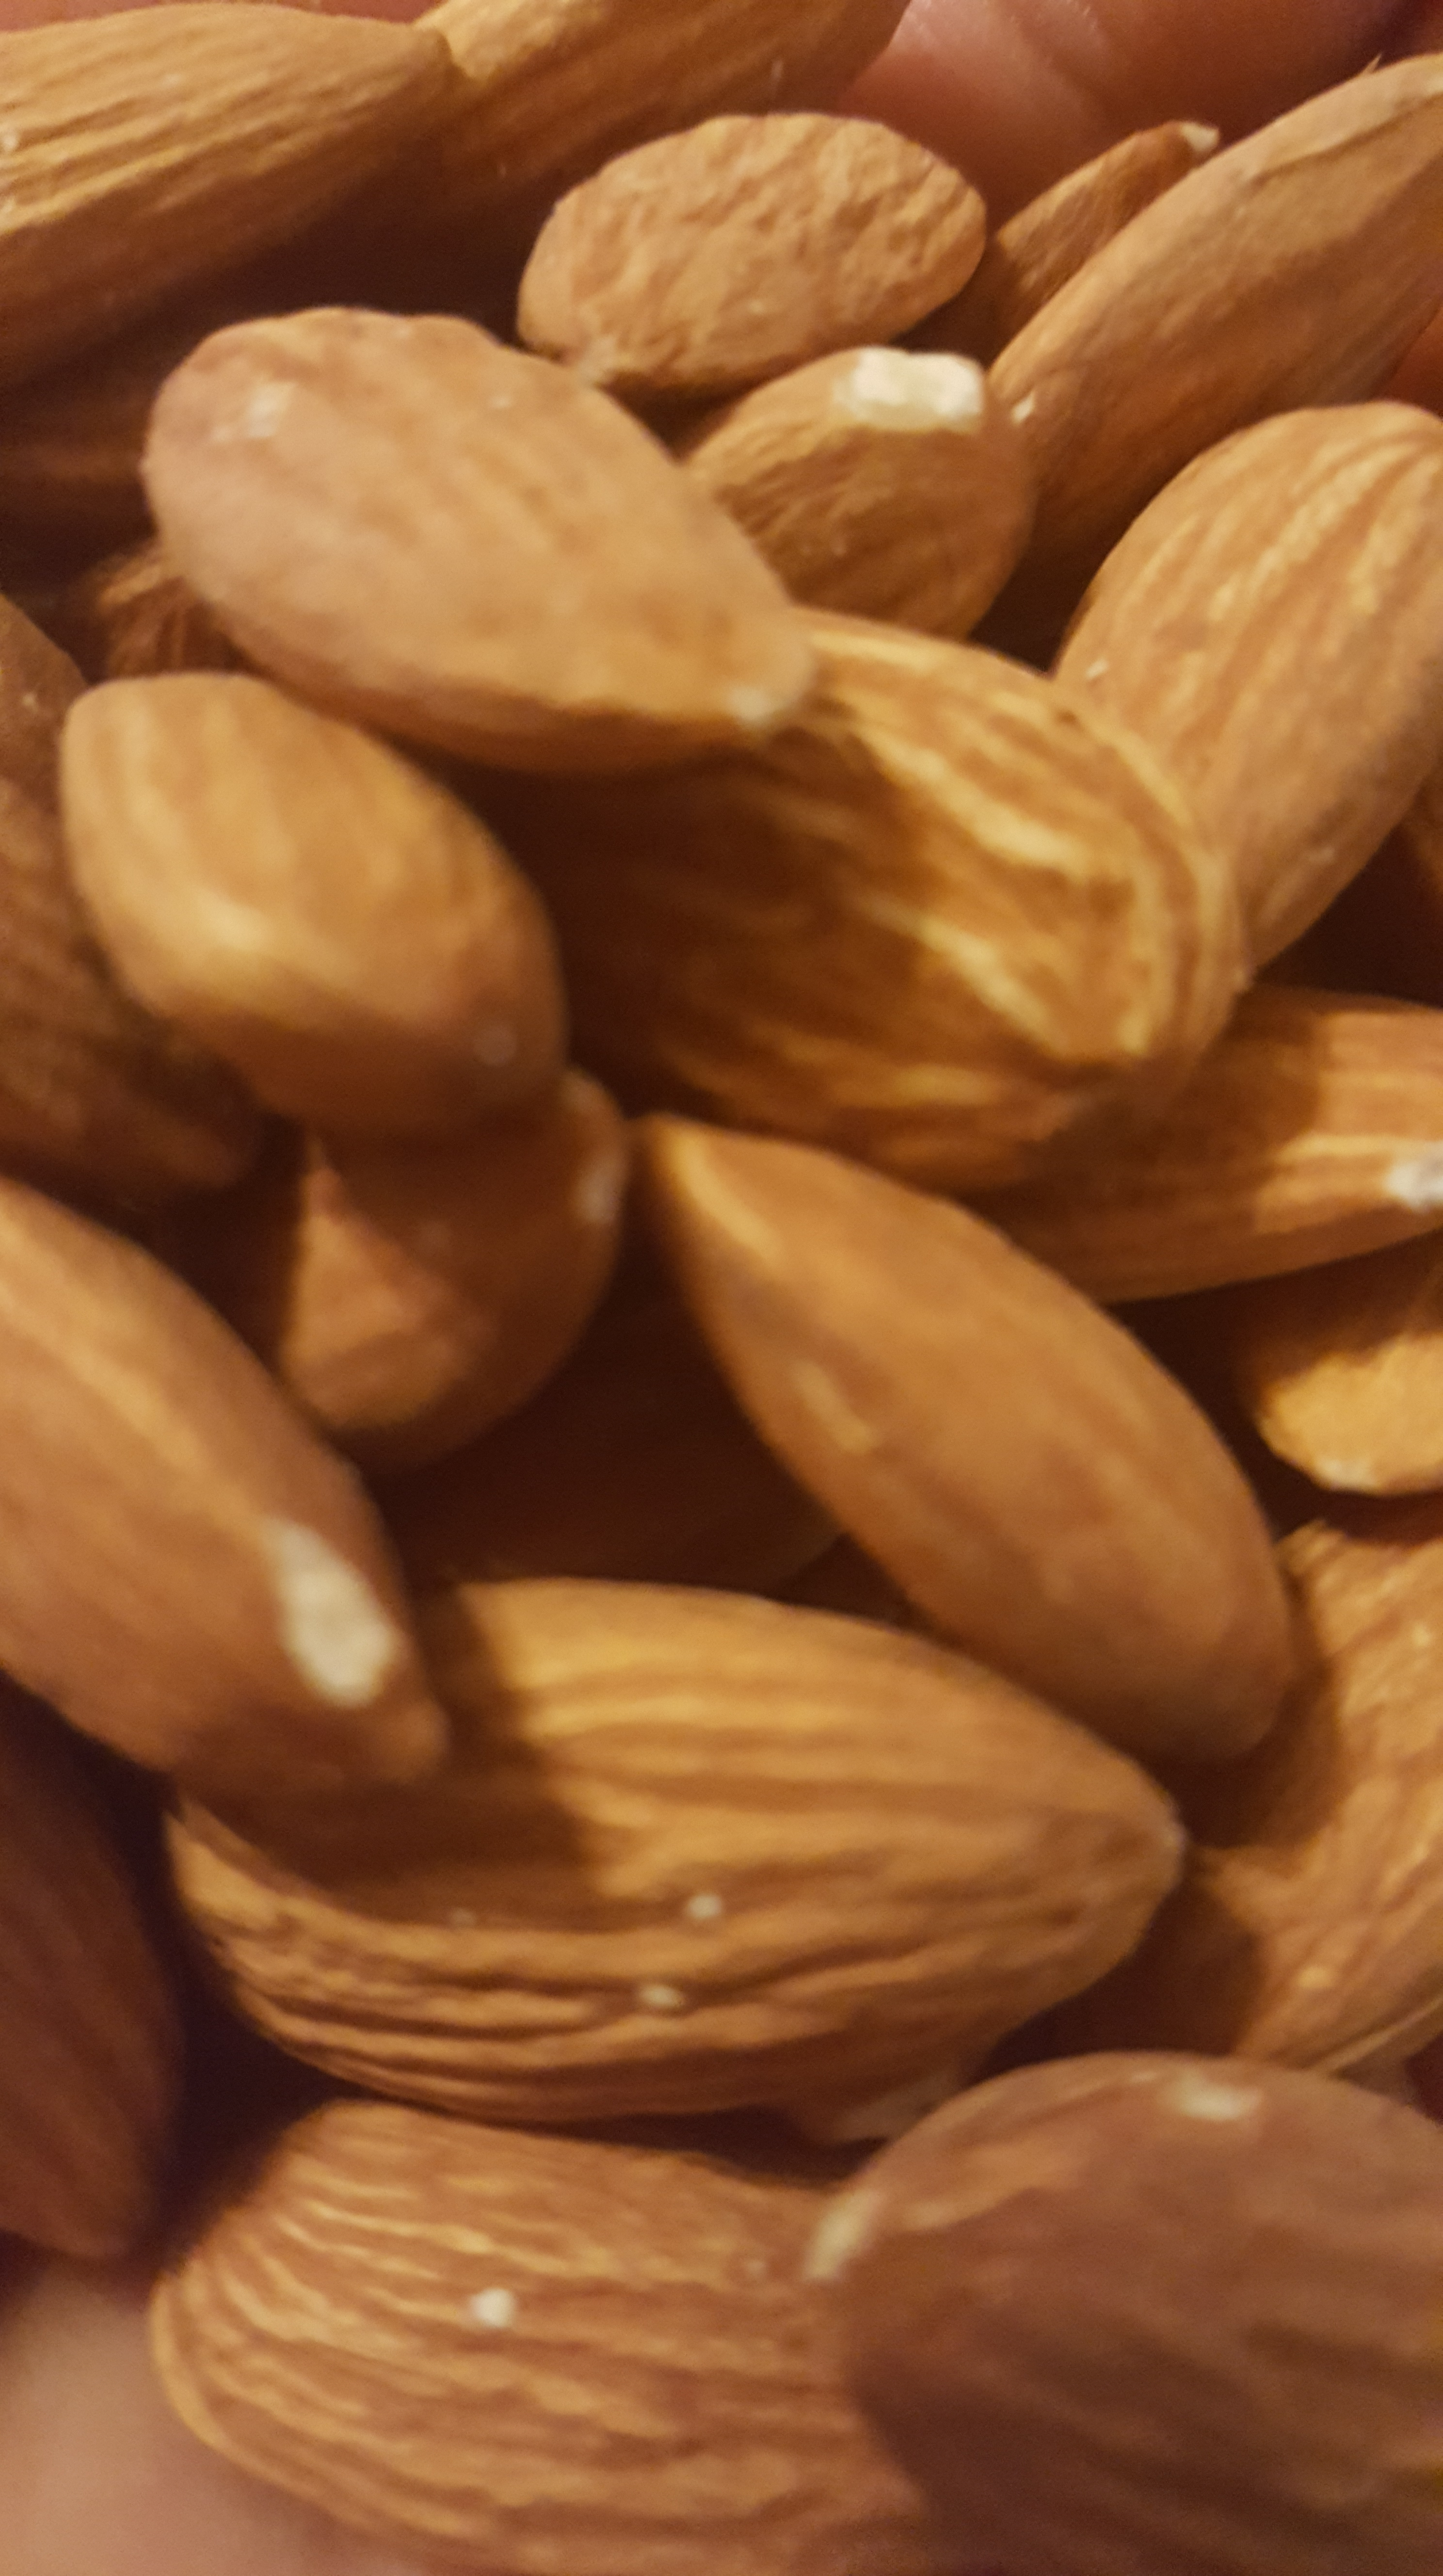 almonds psoriasis diet